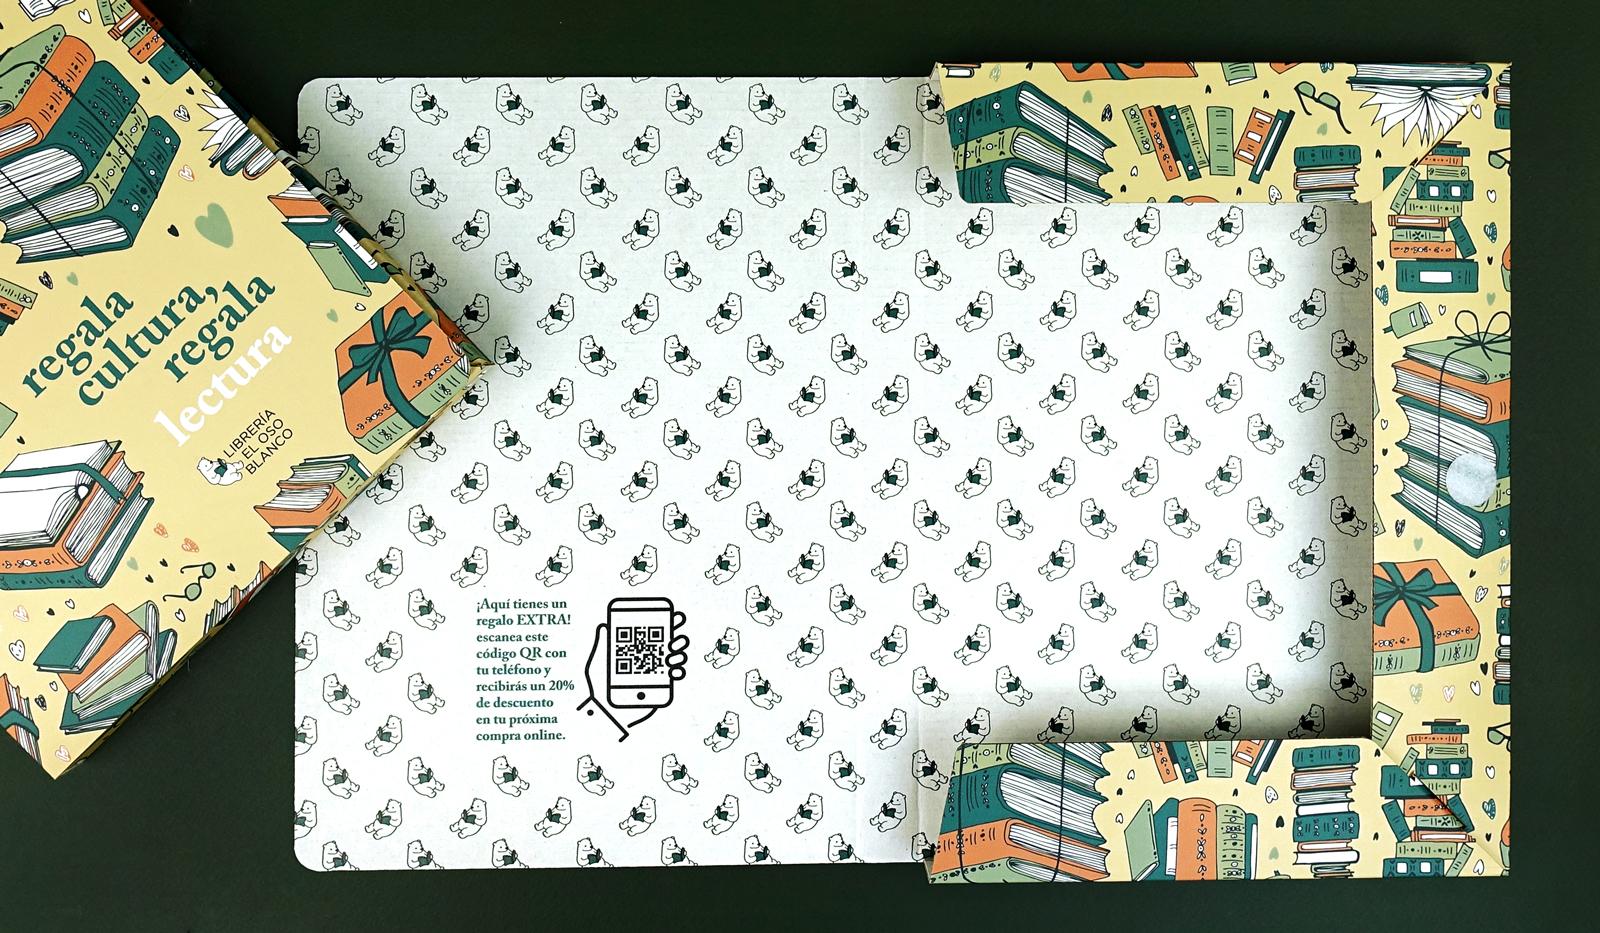 Plantilla de packaging descargable para diseñar